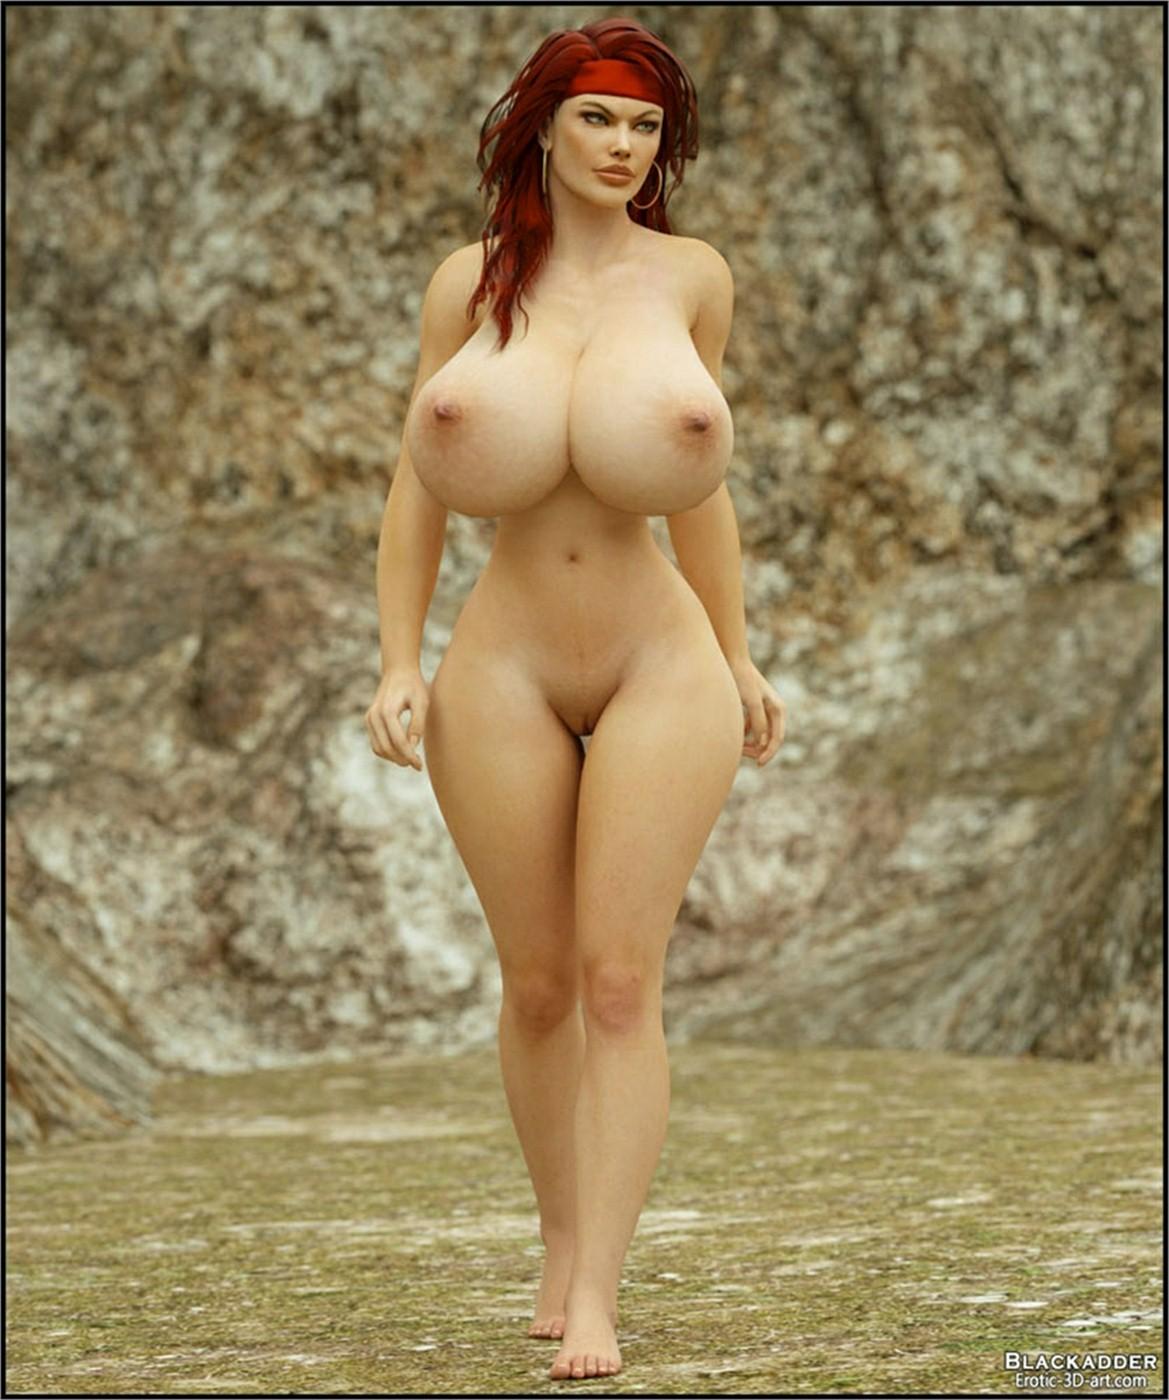 3D Hd Free Porn blackadder- miriam in valley free porn comic - hd porn comics